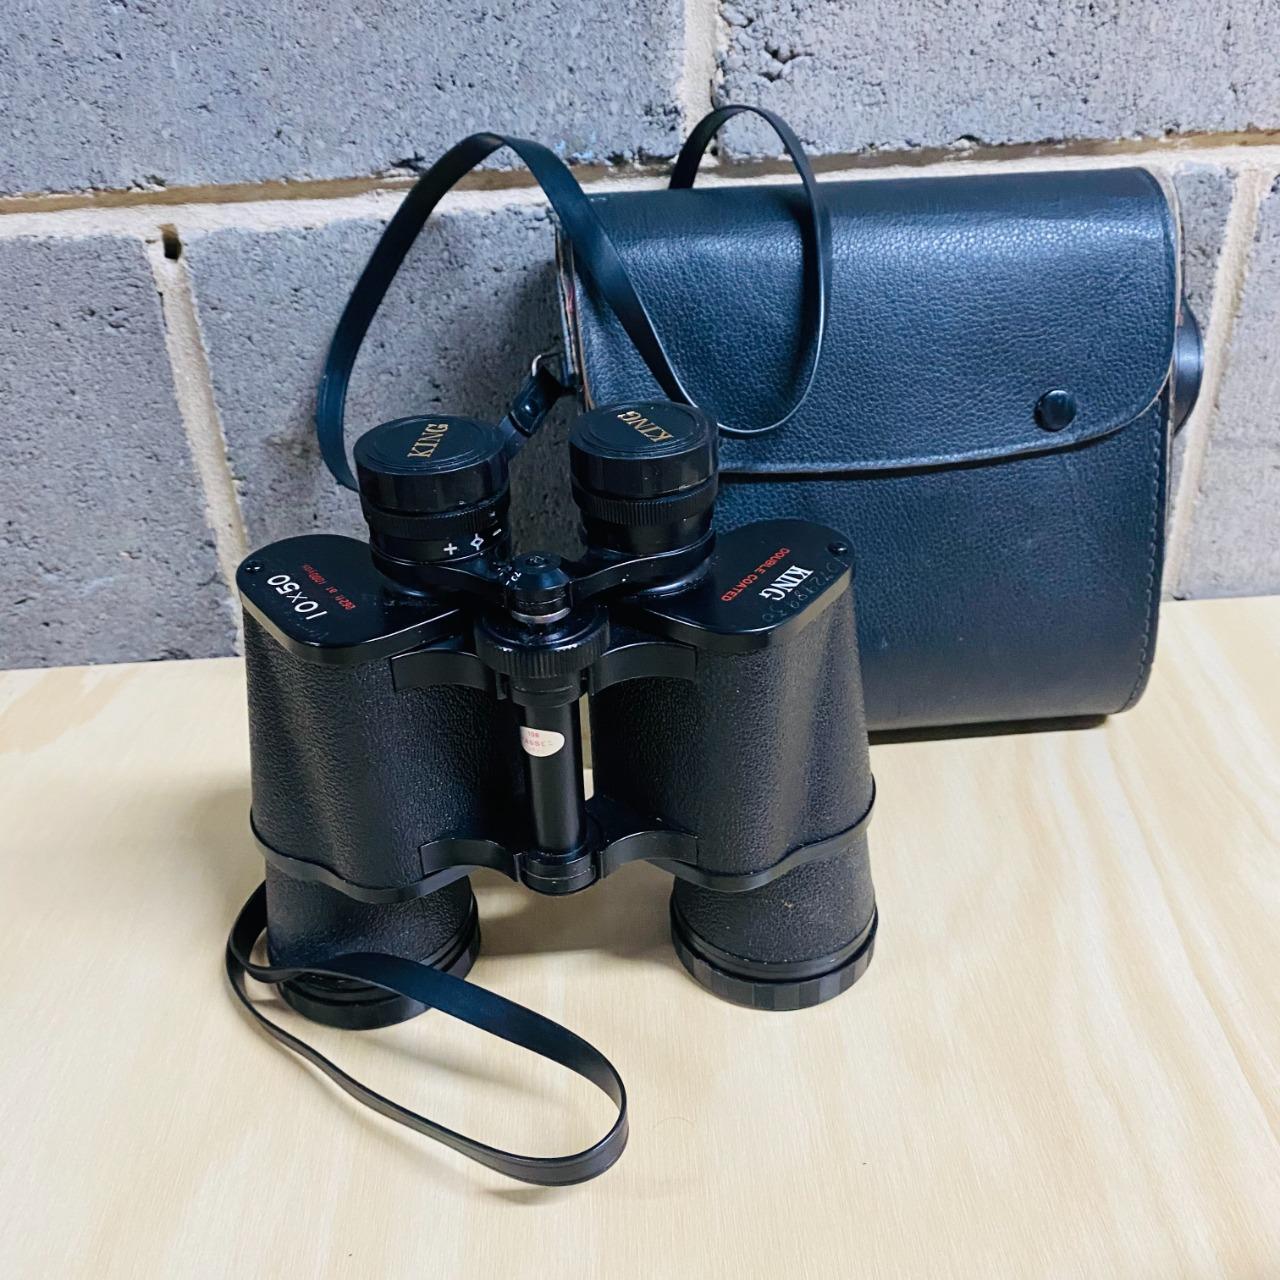 King Brand Binoculars